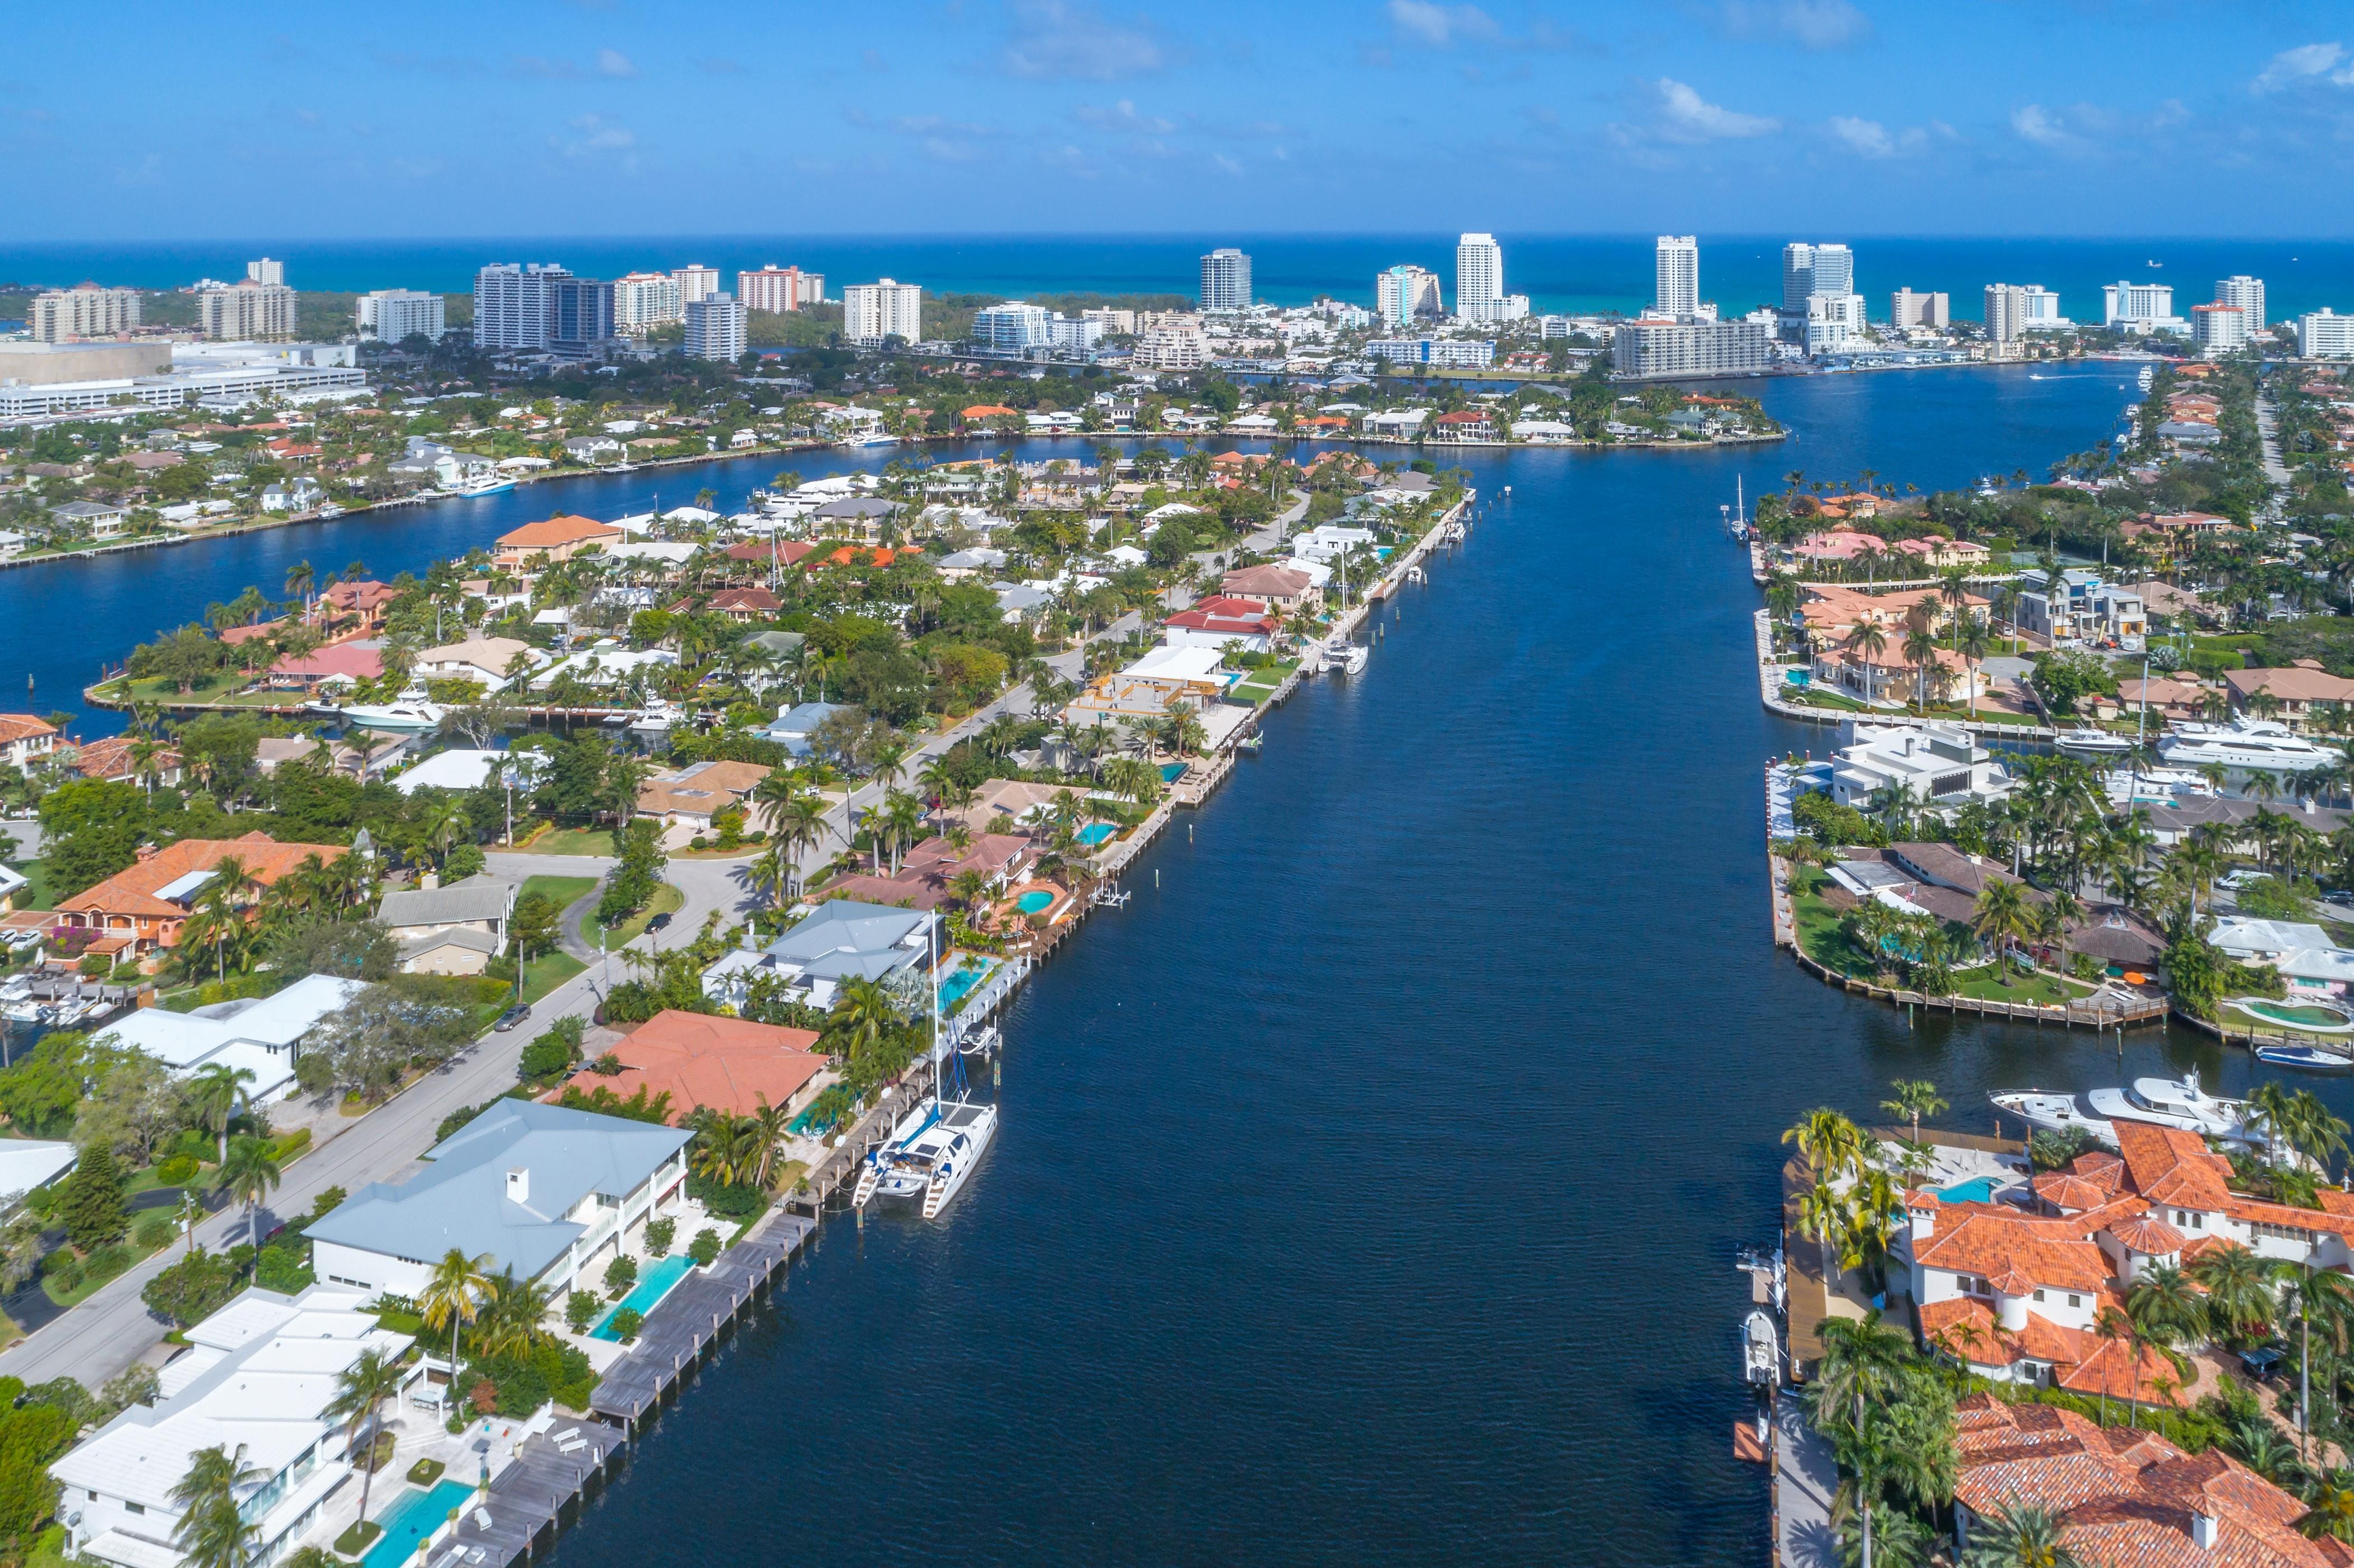 Lauderdale Canals